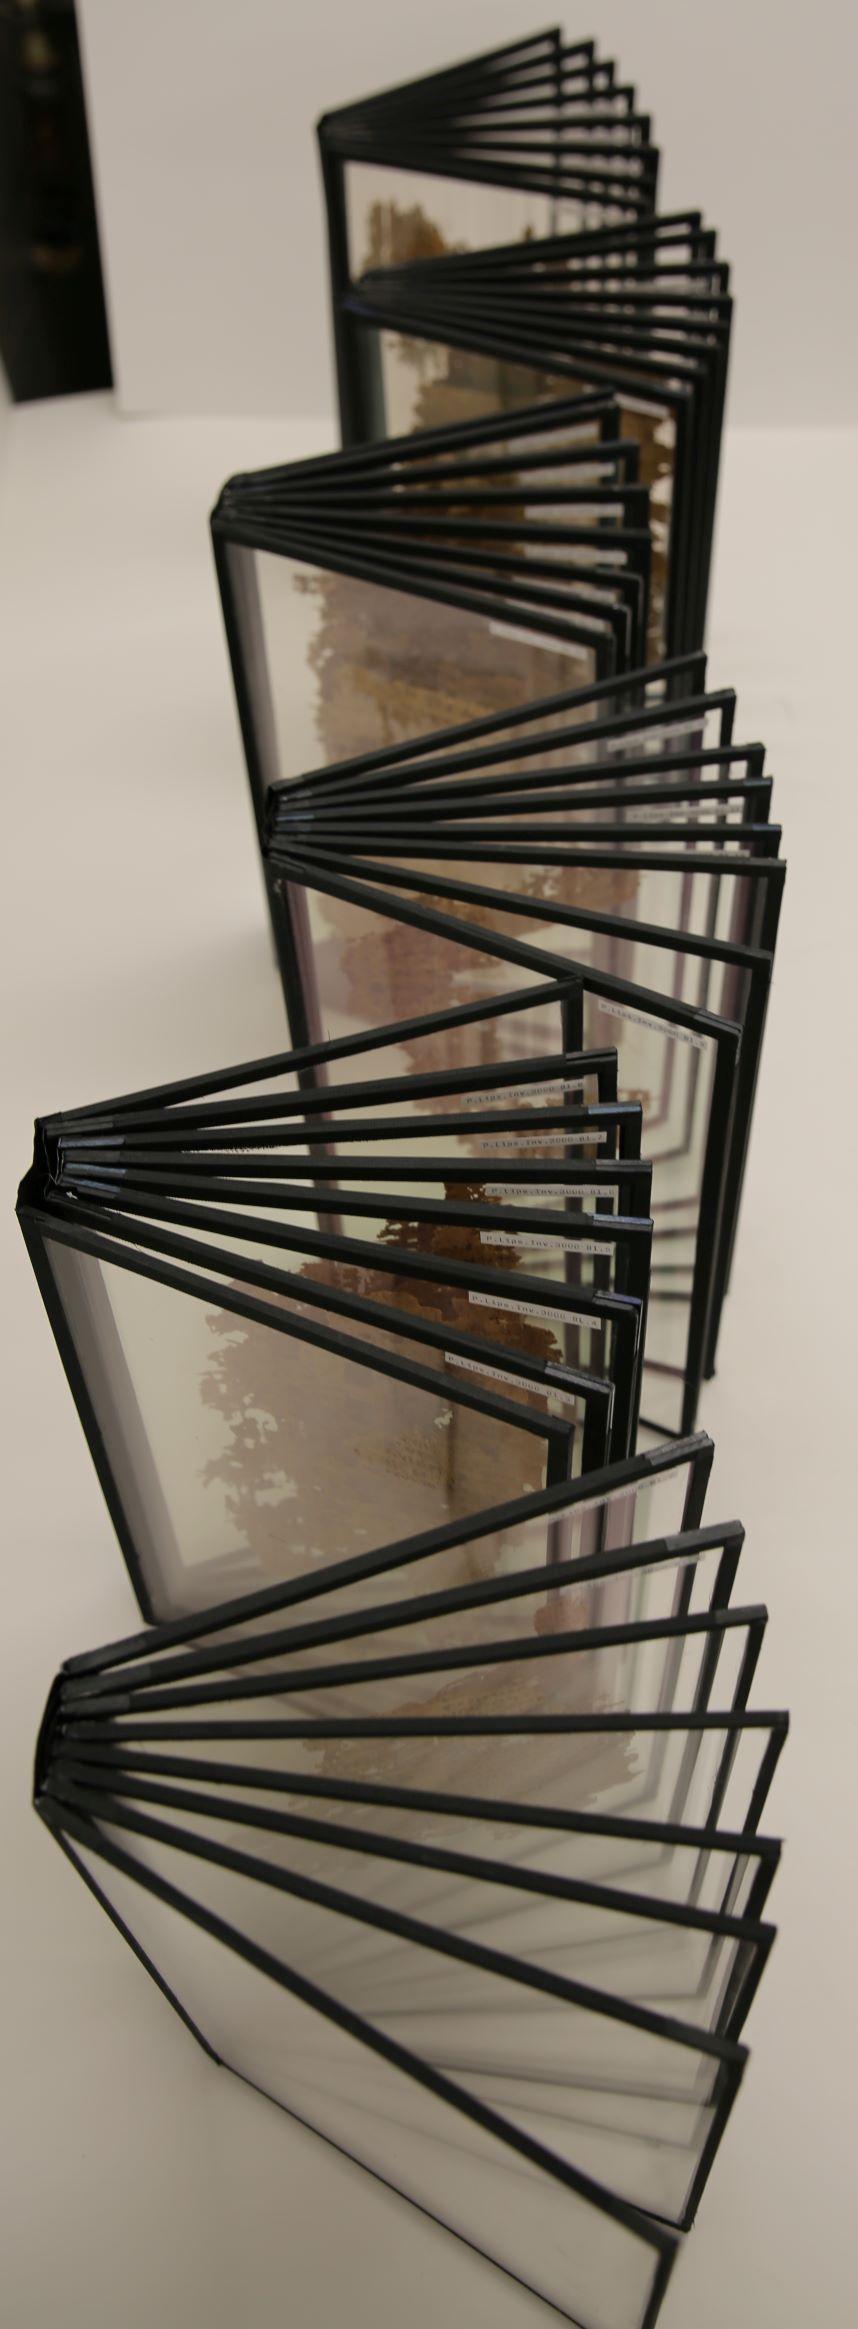 P.Lips. Inv. 3000. Reconstruction